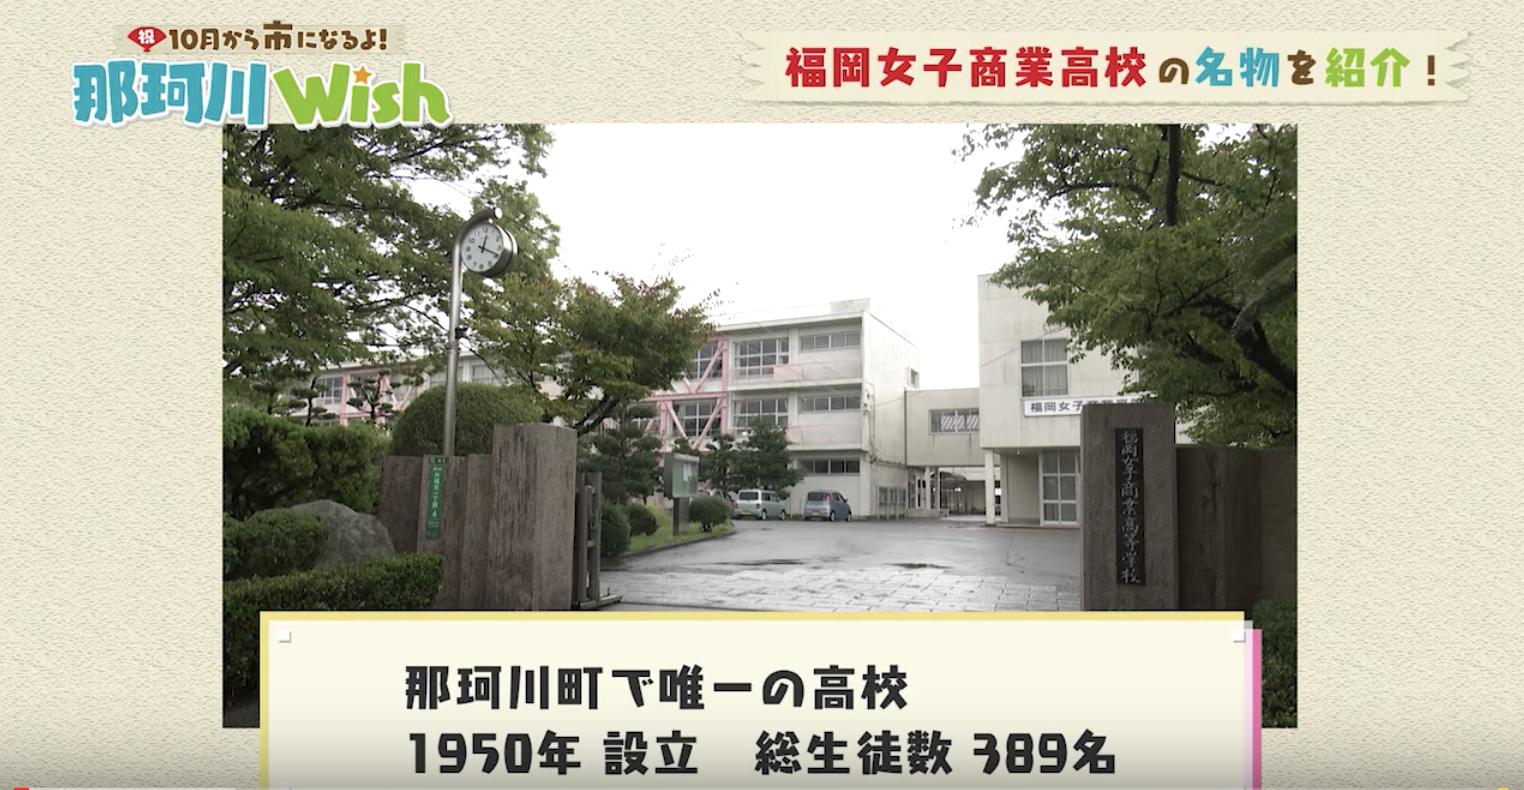 KBC「ガクセイWish」で福岡女子商業高等学校が紹介されました